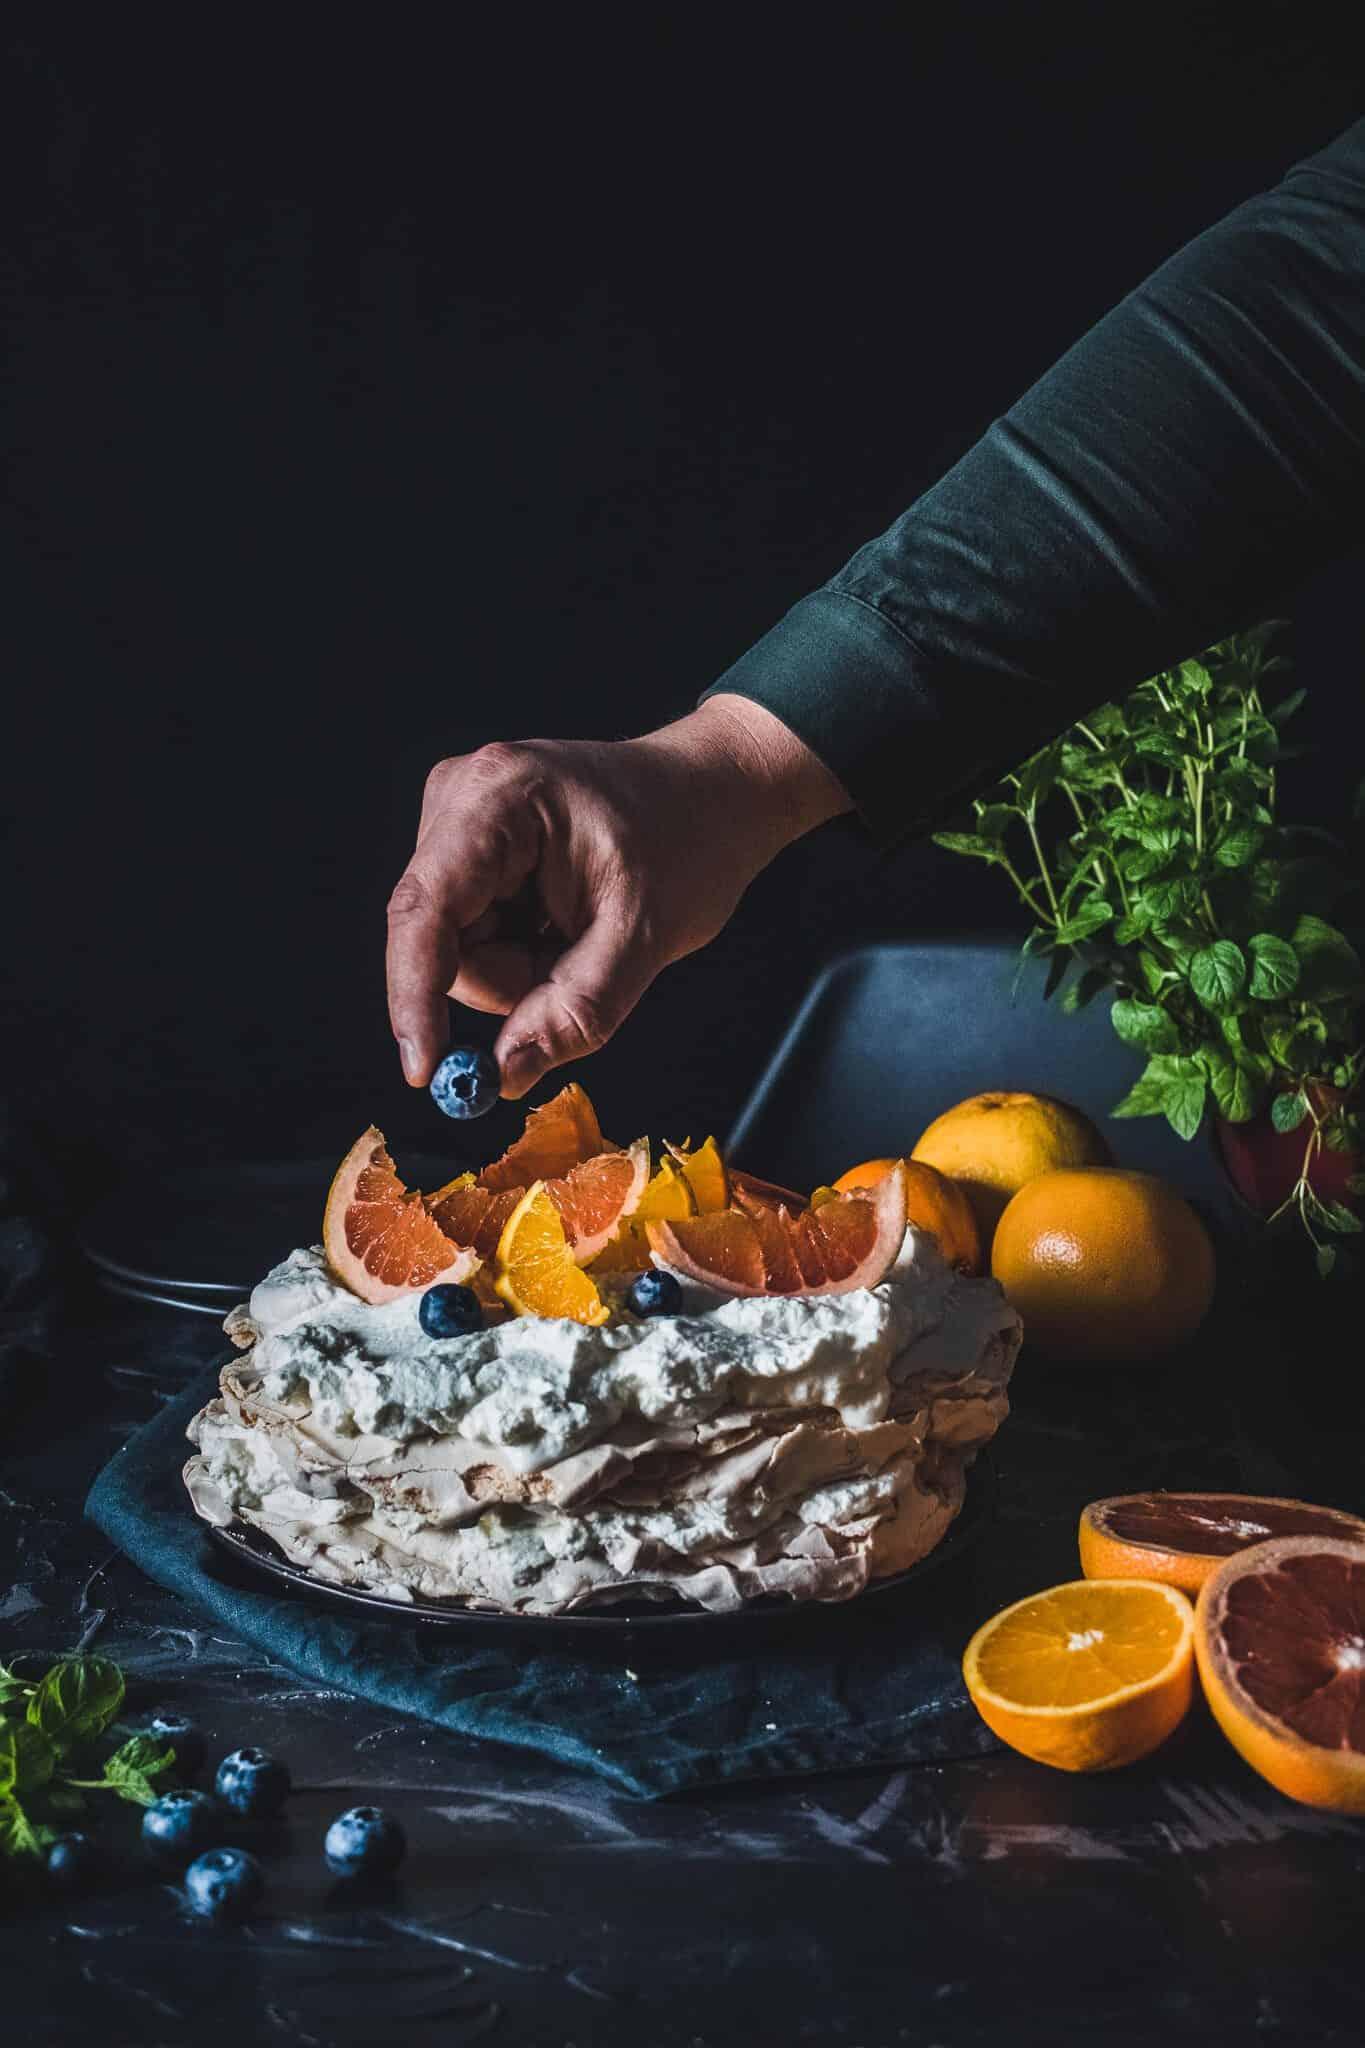 Blood orange Pavlova with blueberries.